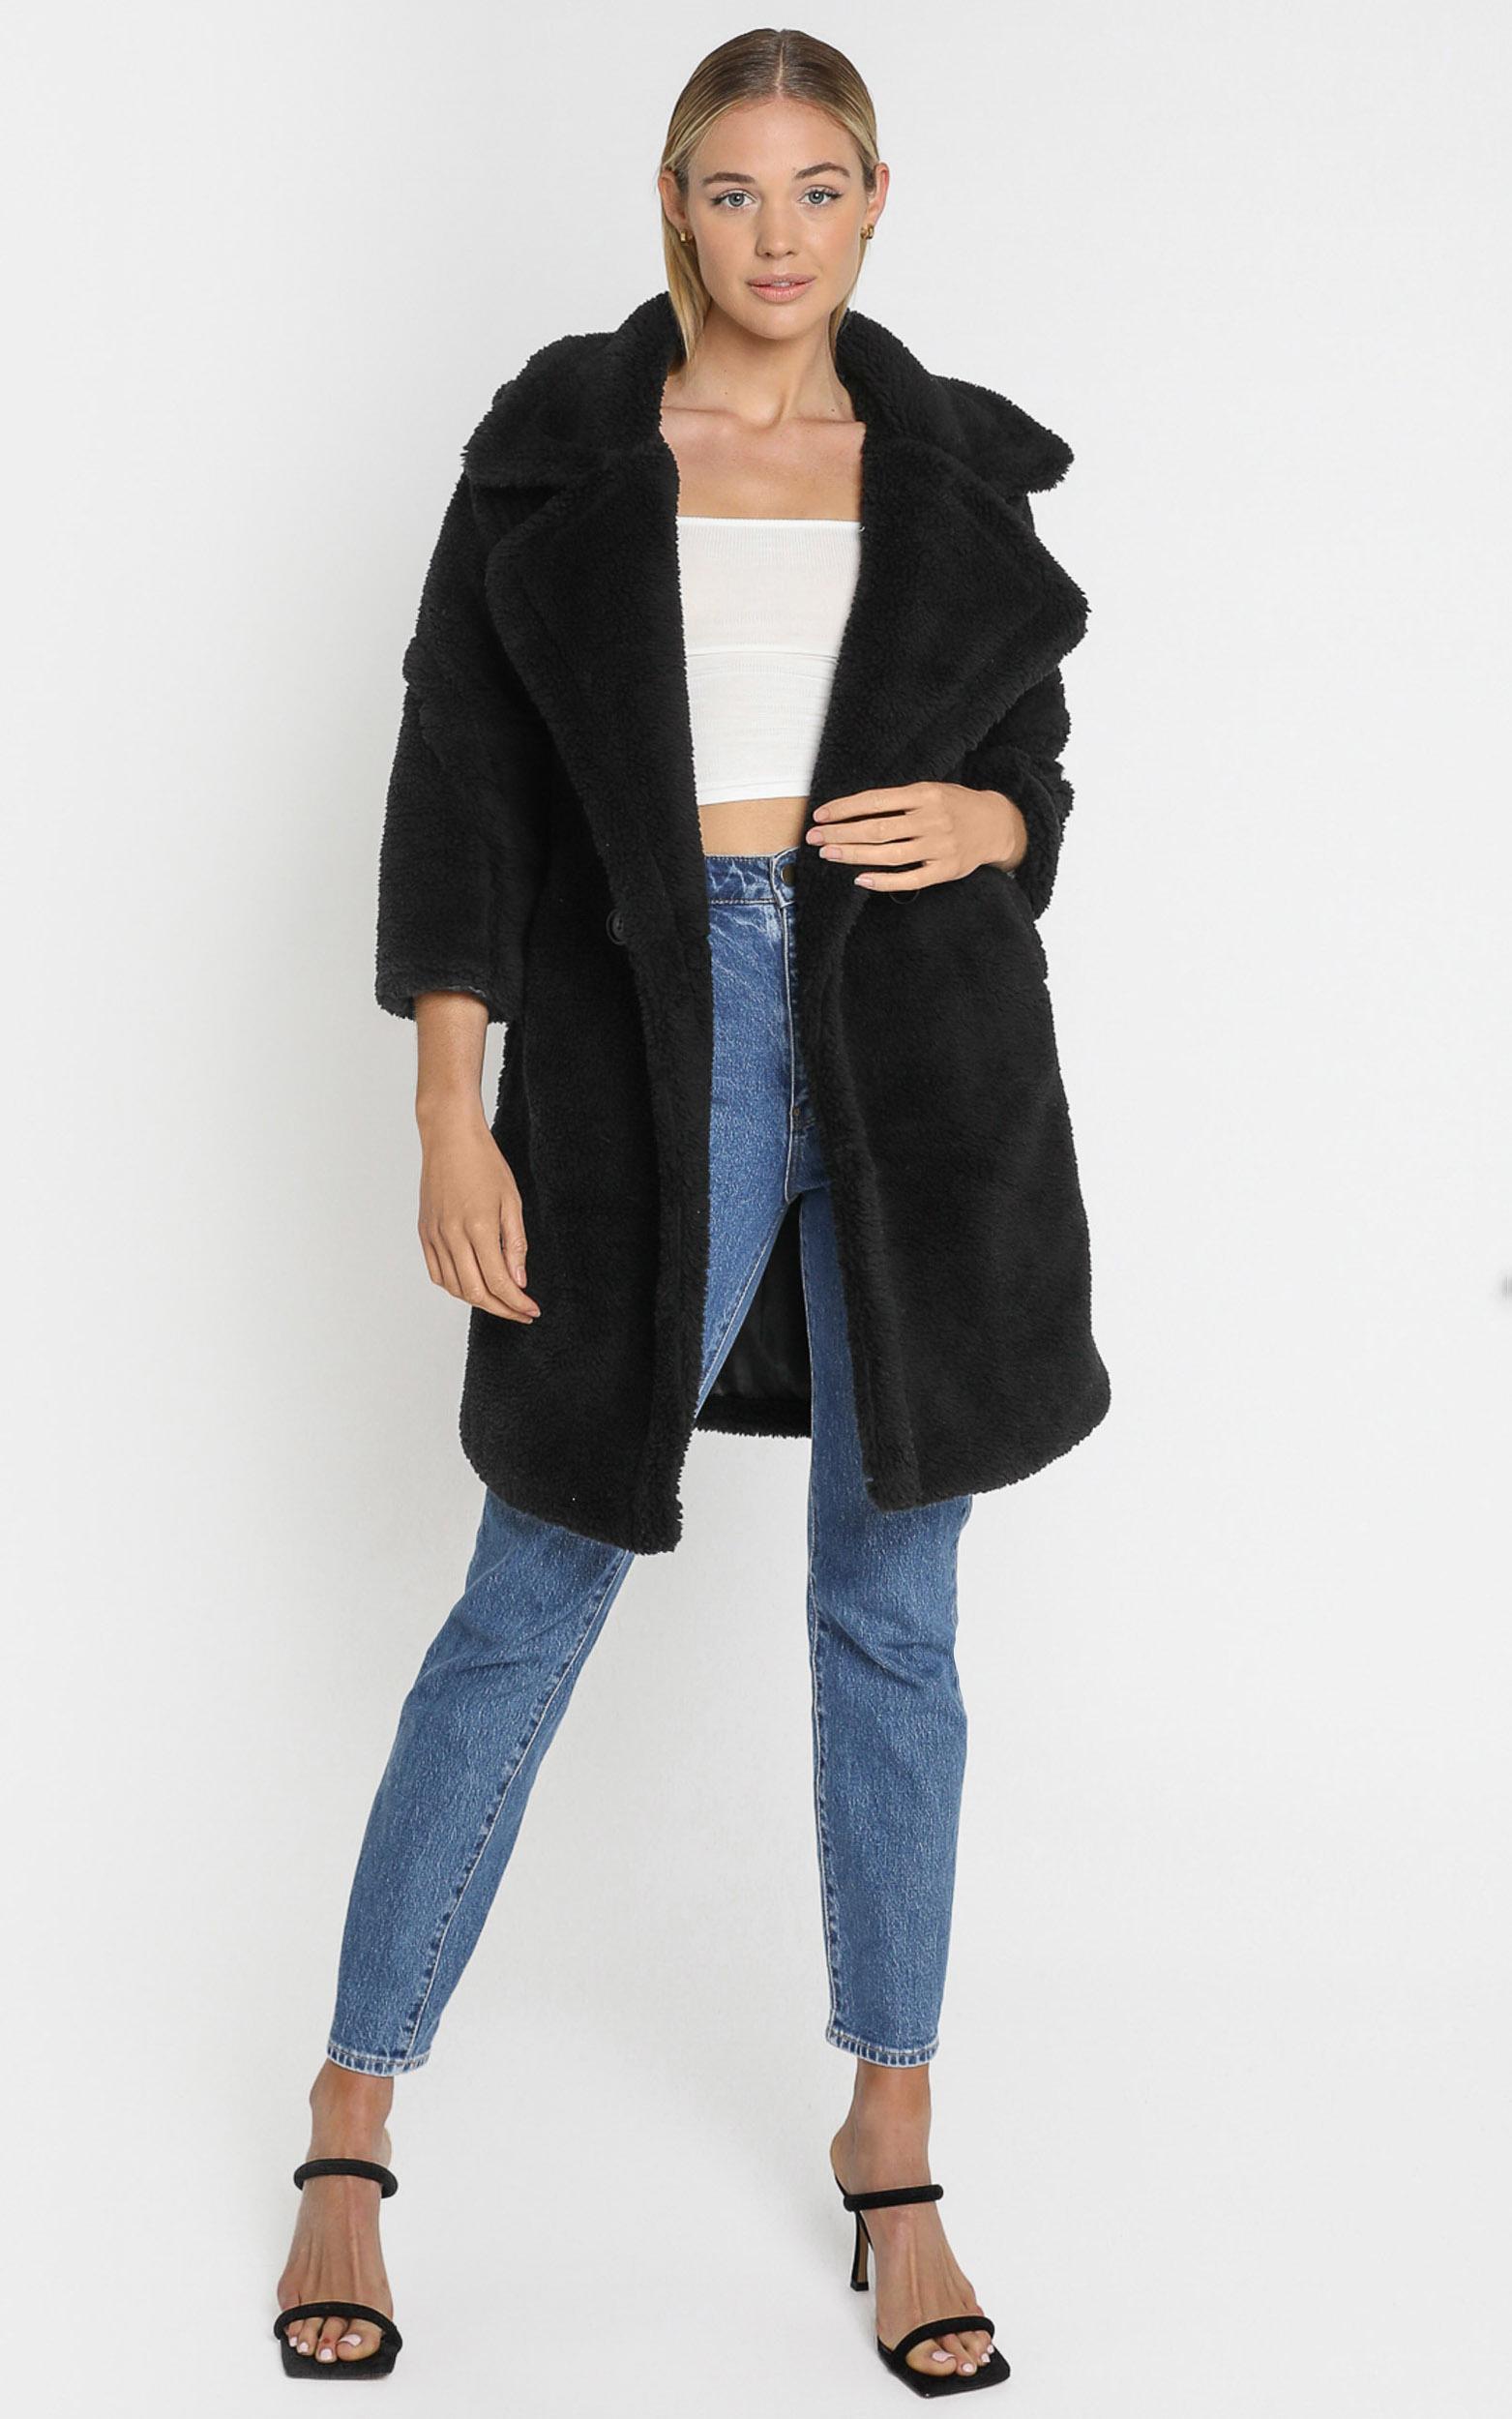 Olwen Coat in Black - S, Black, hi-res image number null